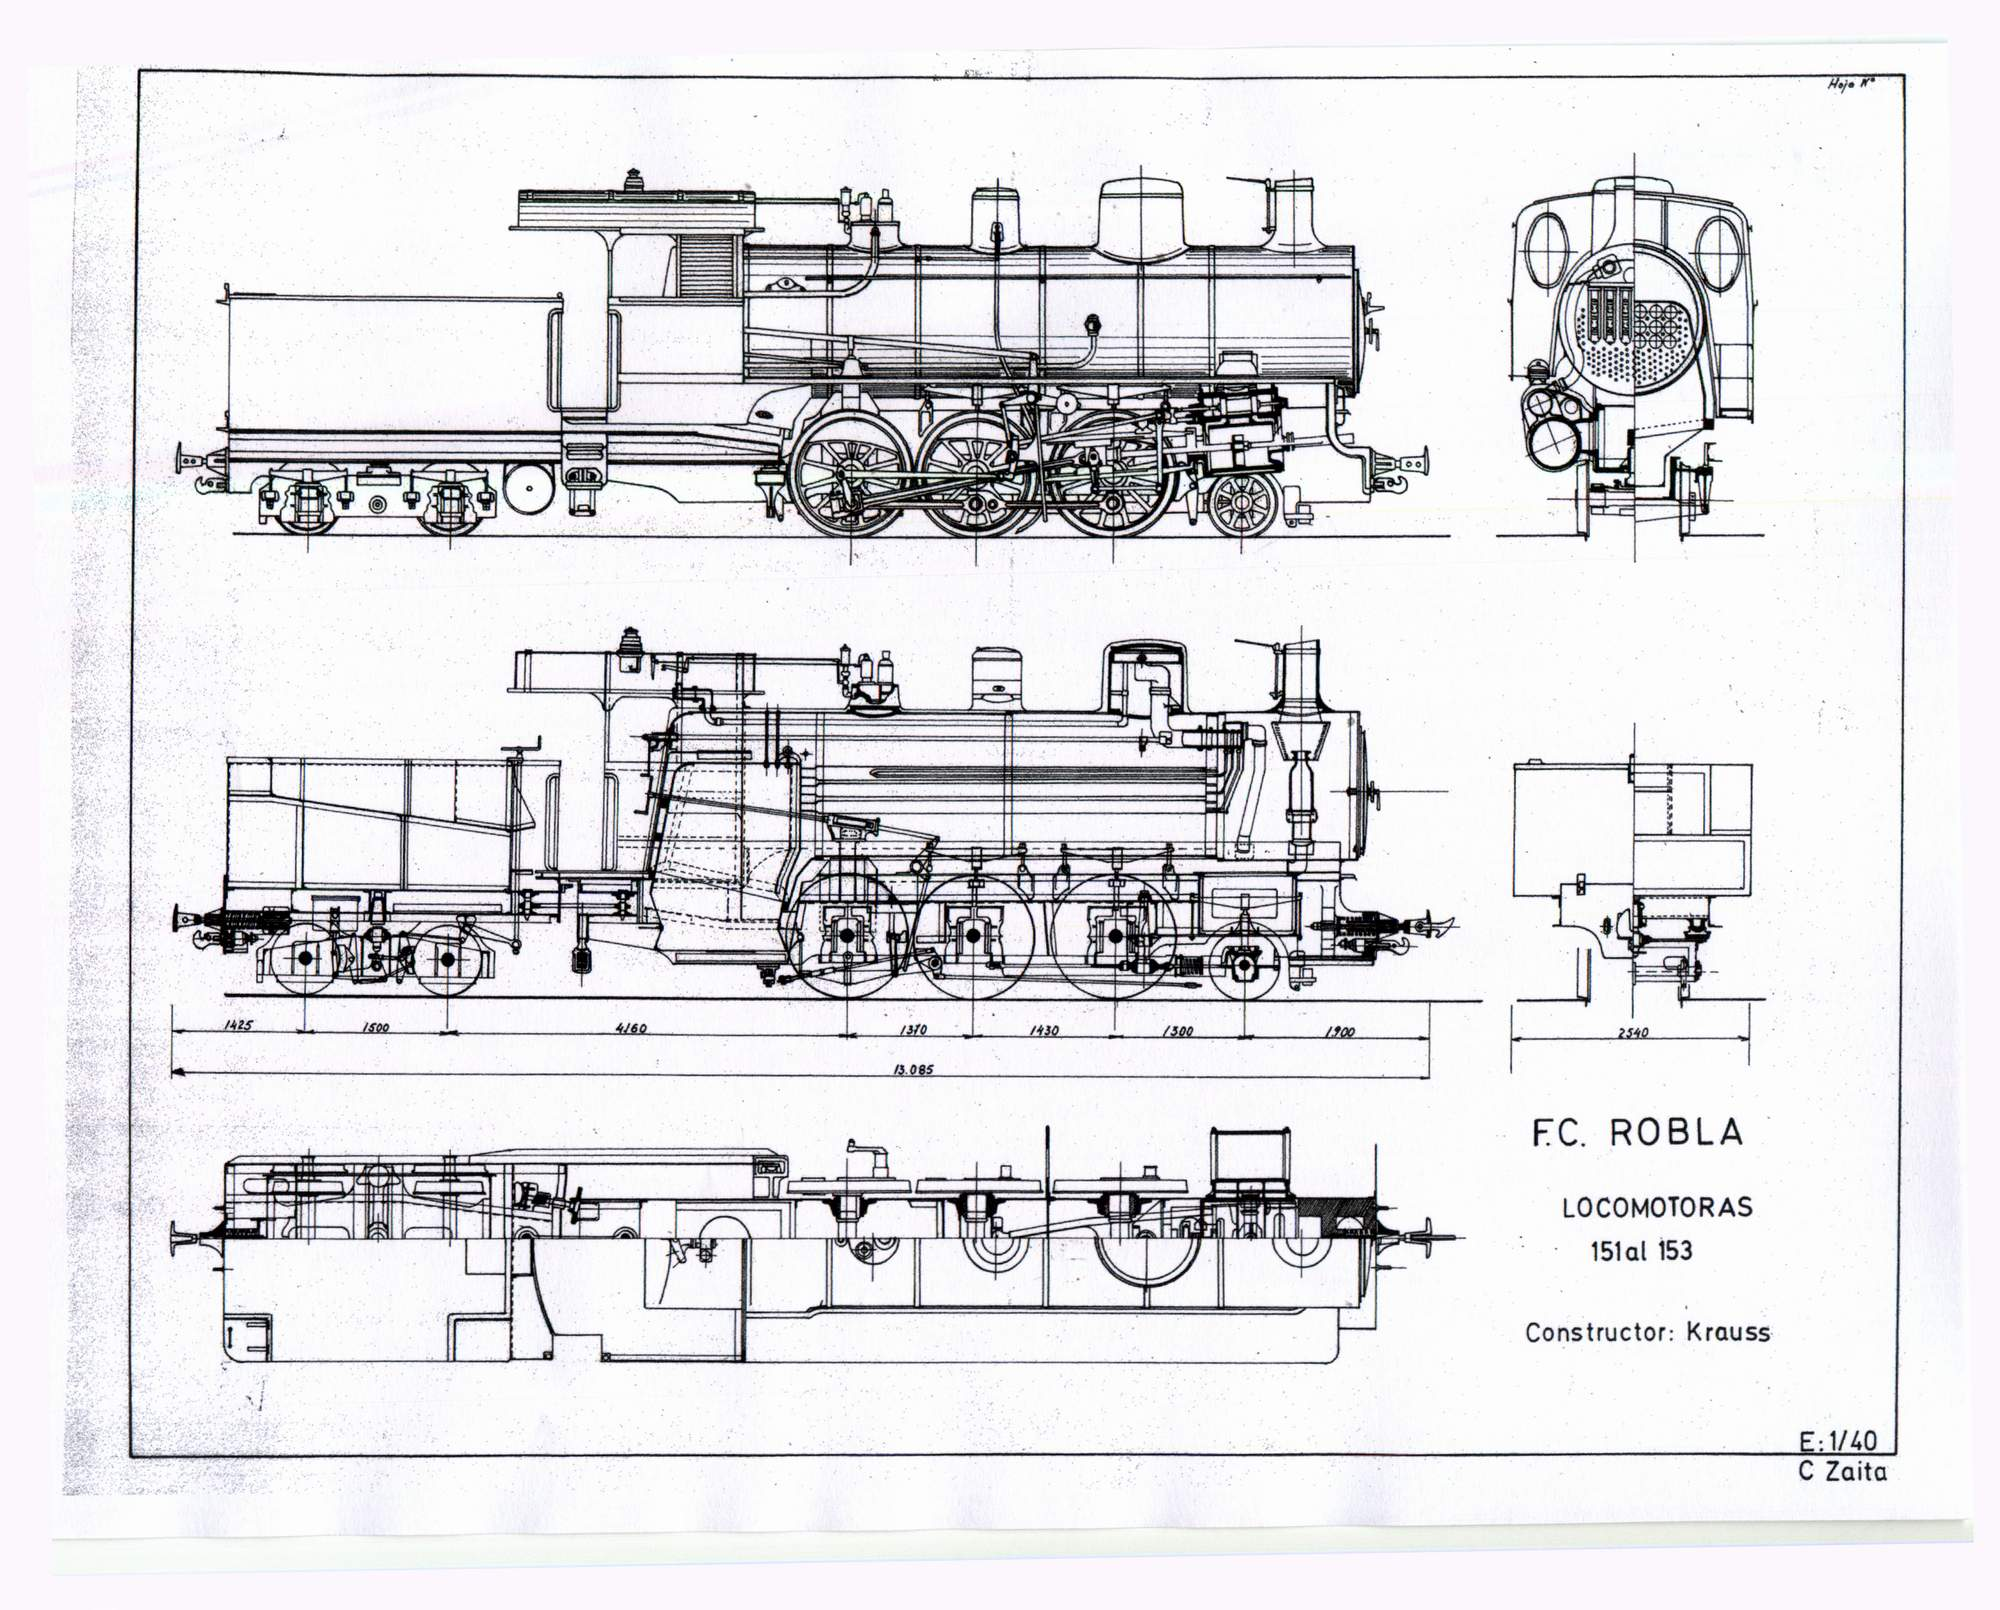 Locomotoras serie 130/ dibujo : Carmelo Zaita